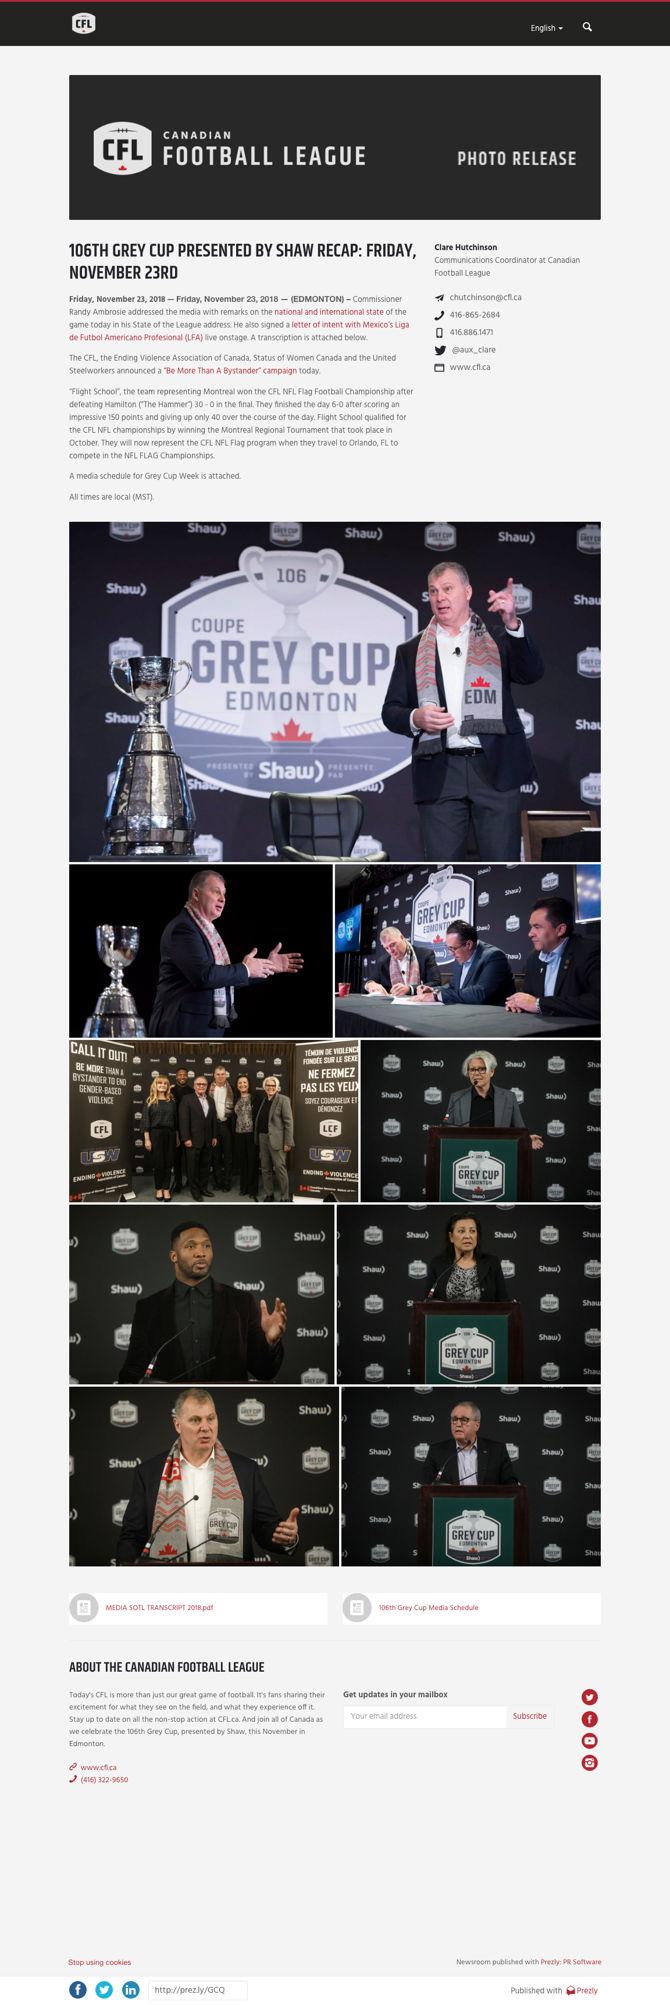 106TH GREY CUP PRESENTED BY SHAW RECAP: FRIDAY, NOVEMBER 23RD